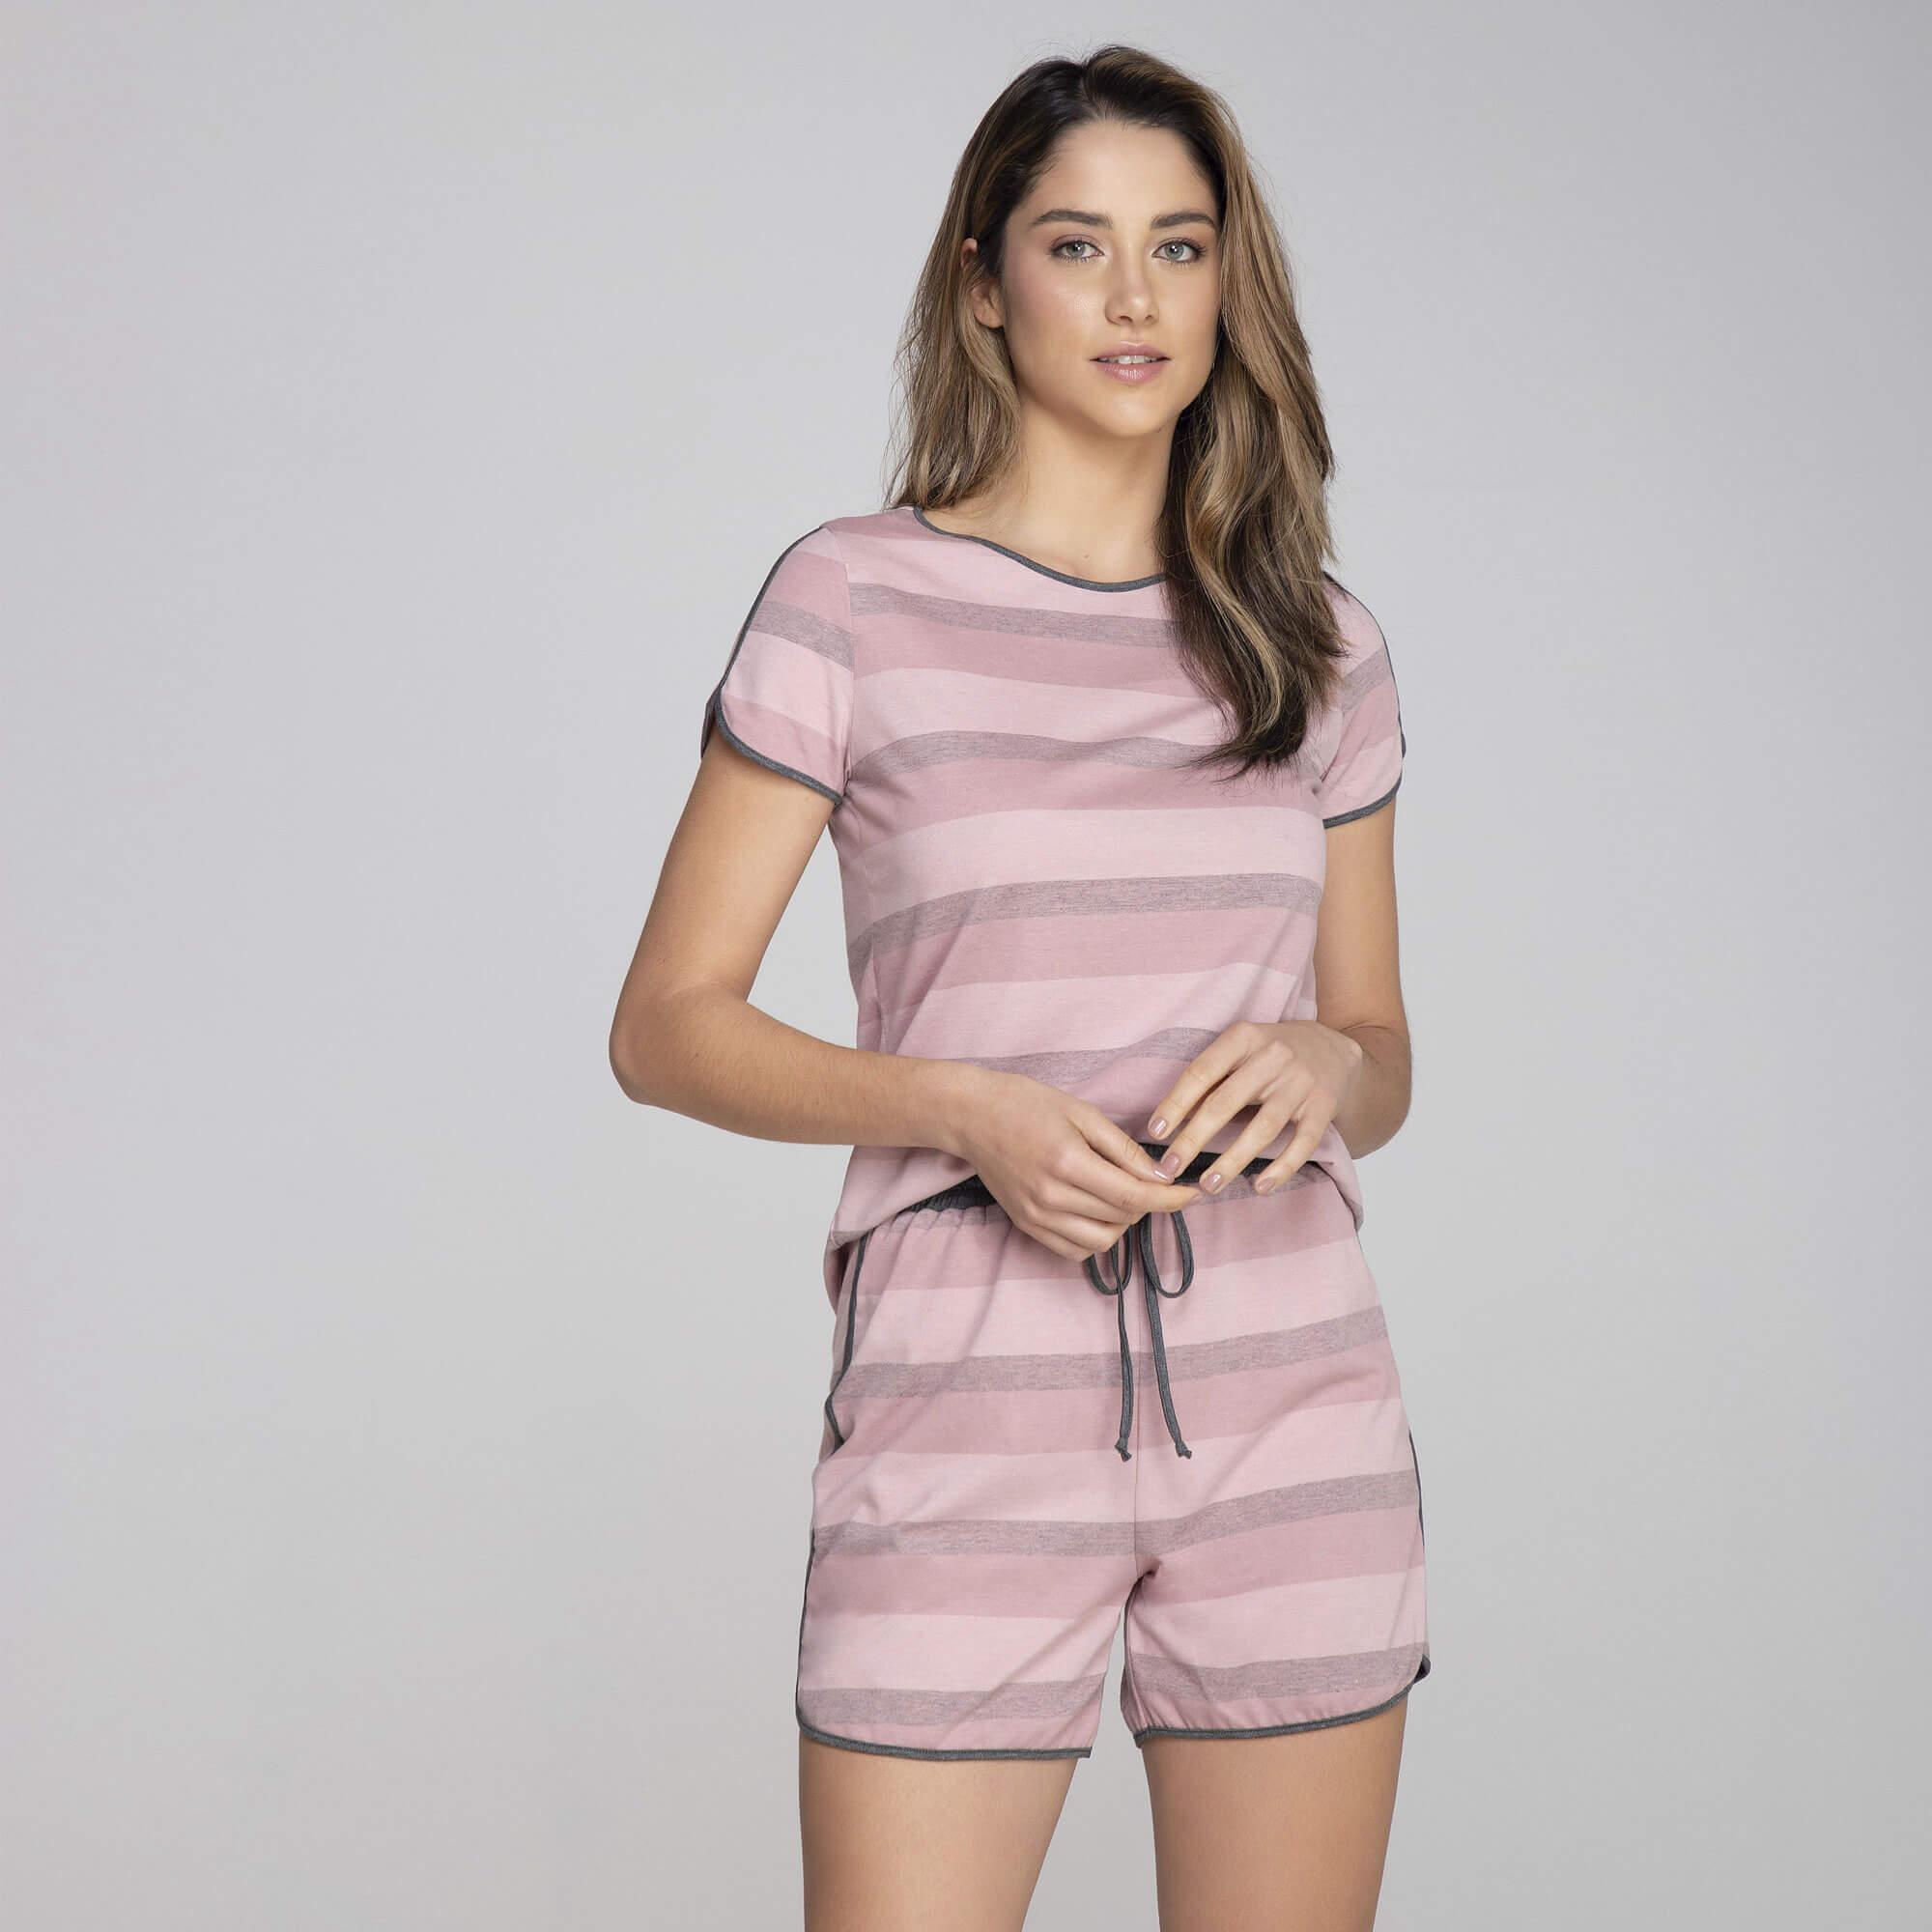 Pijama Curto Listras